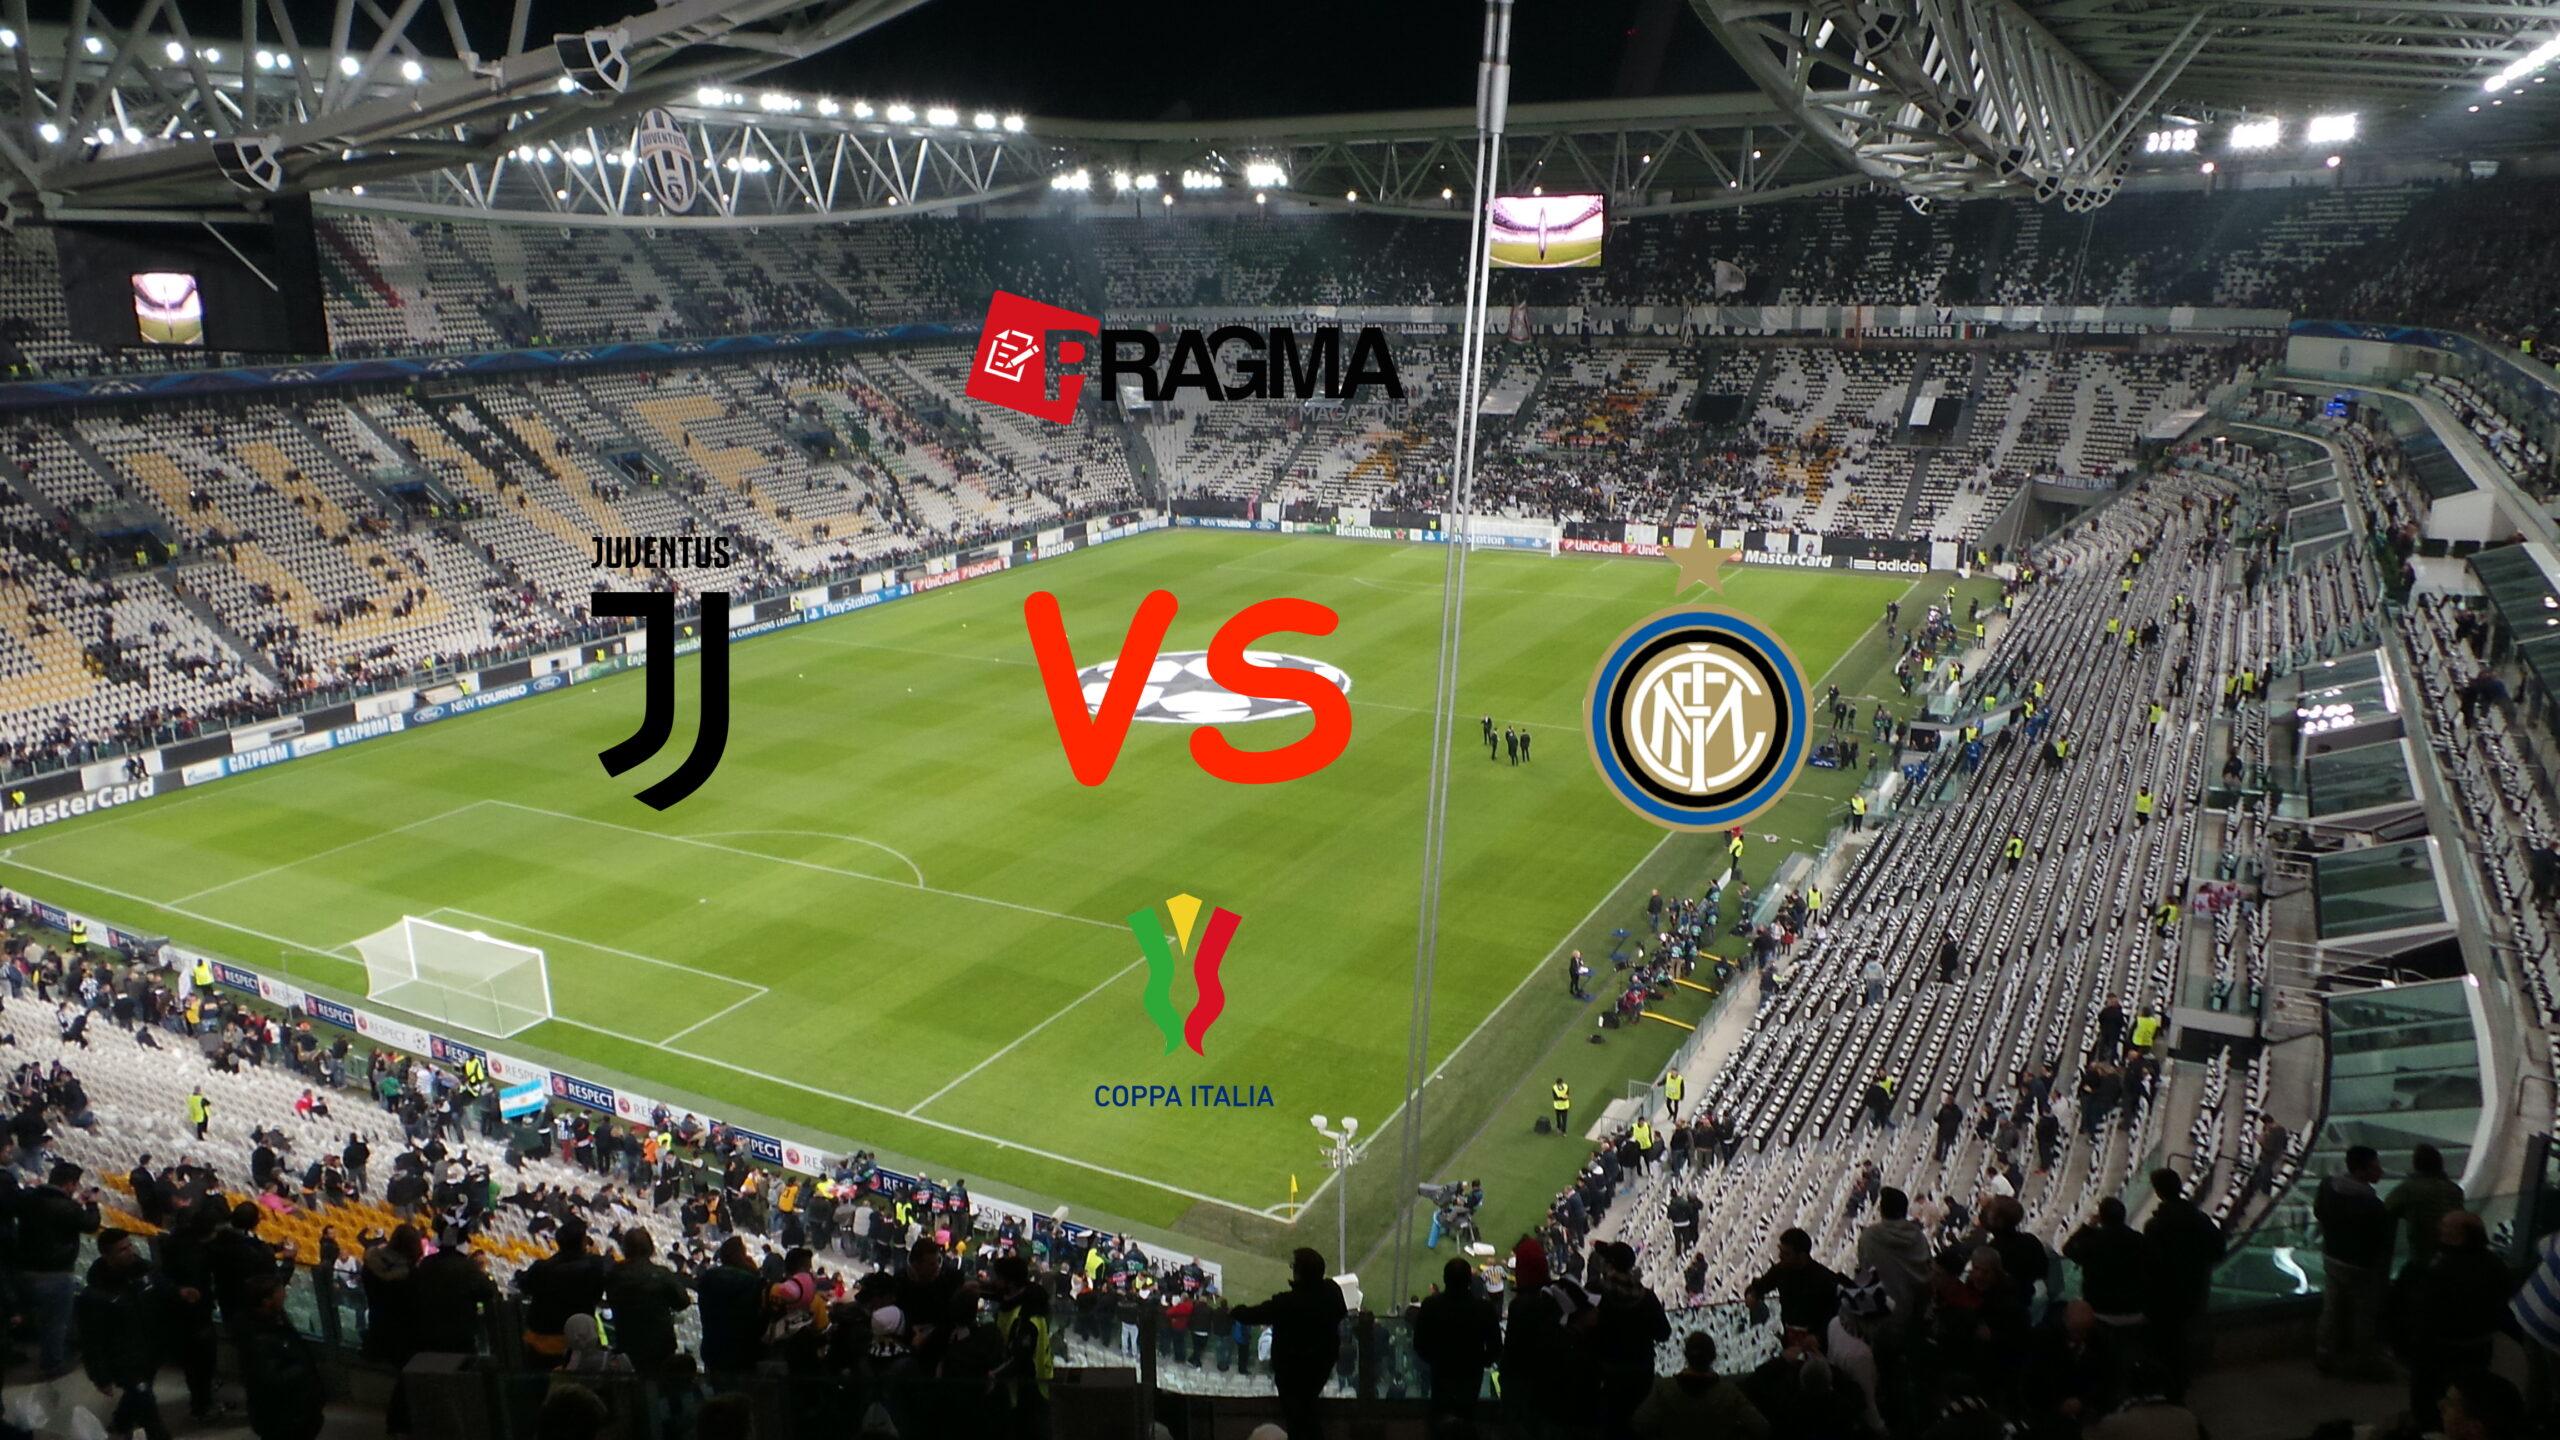 Juve - Inter